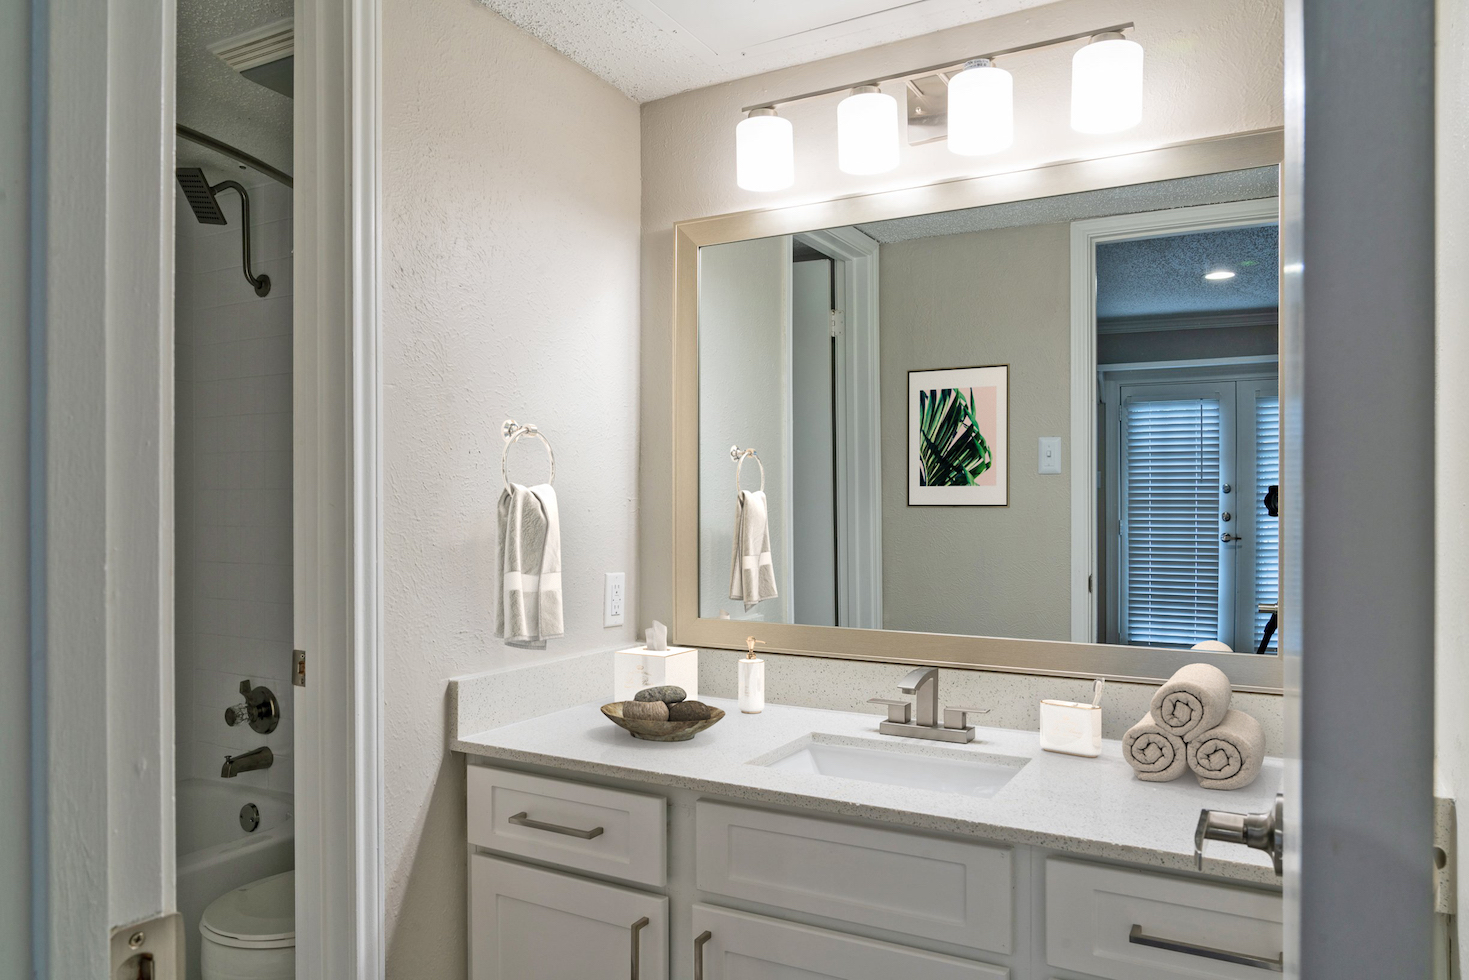 Large Granite Vanity at Westmount at River Park Apartments in Fort Worth, TX